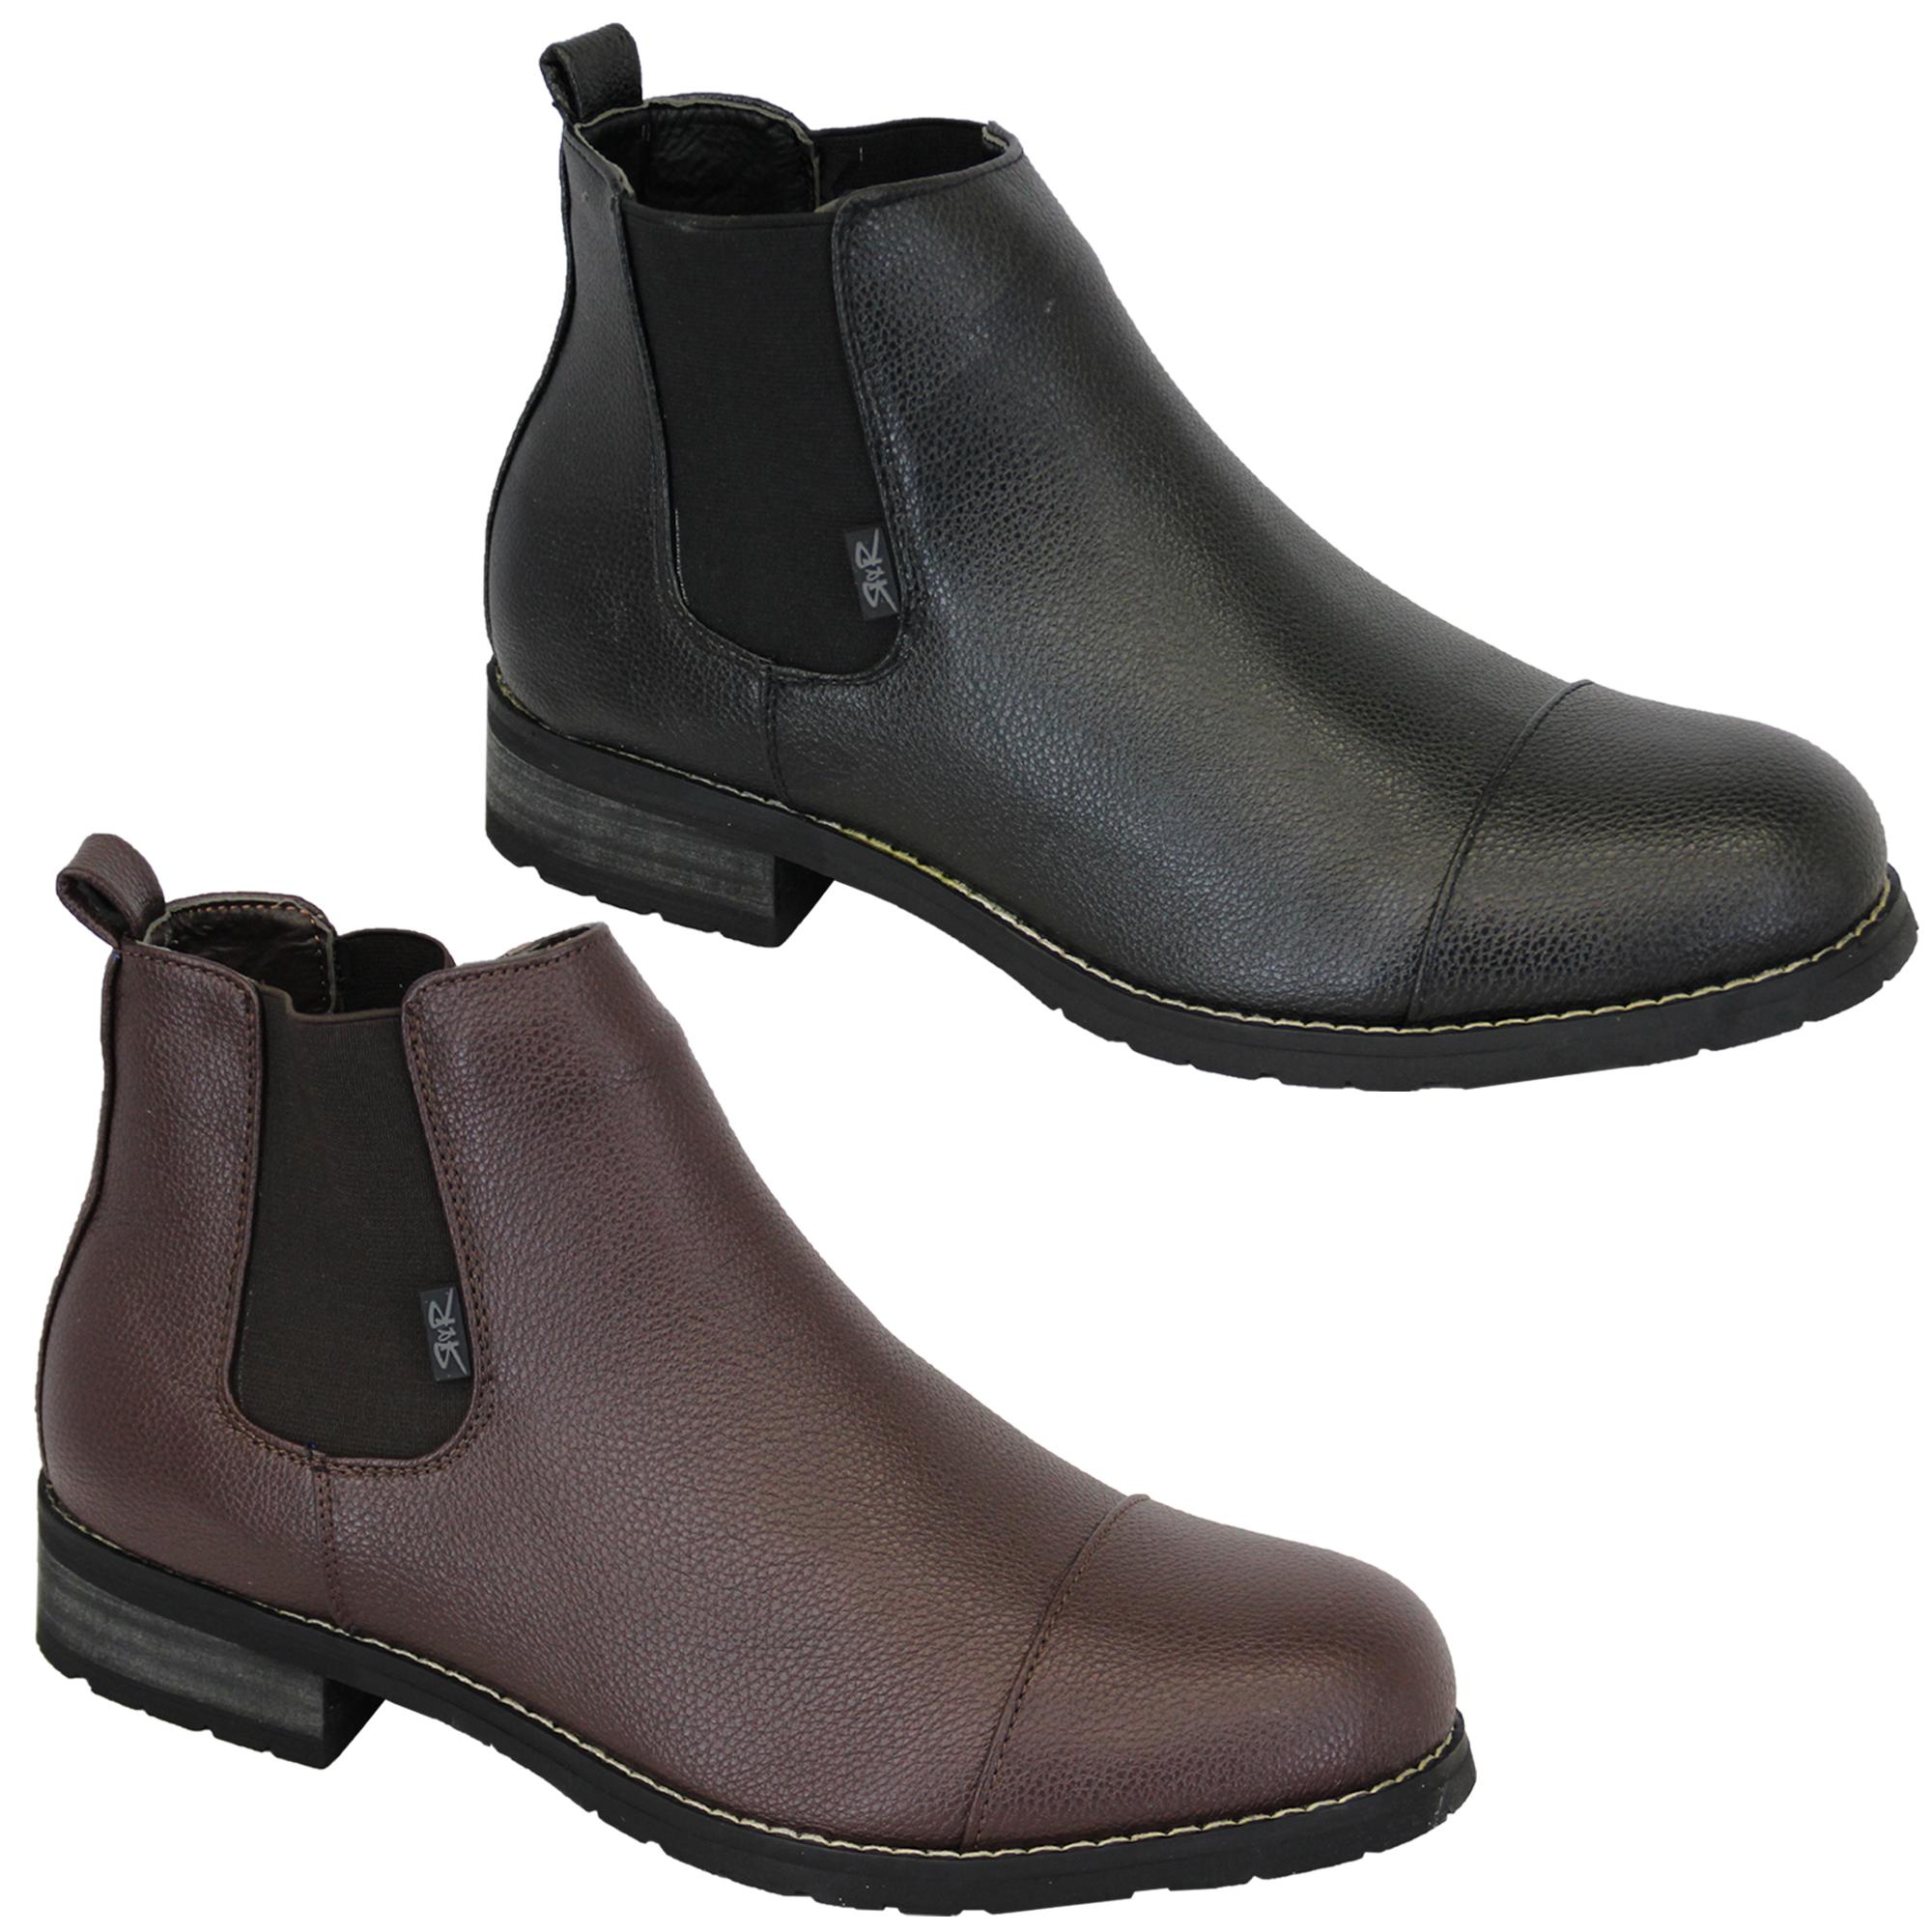 a9cc8cd7fb8 Details about Mens Chelsea Boots Rock & Religion Dealer High Ankle Leather  Look Shoes Designer